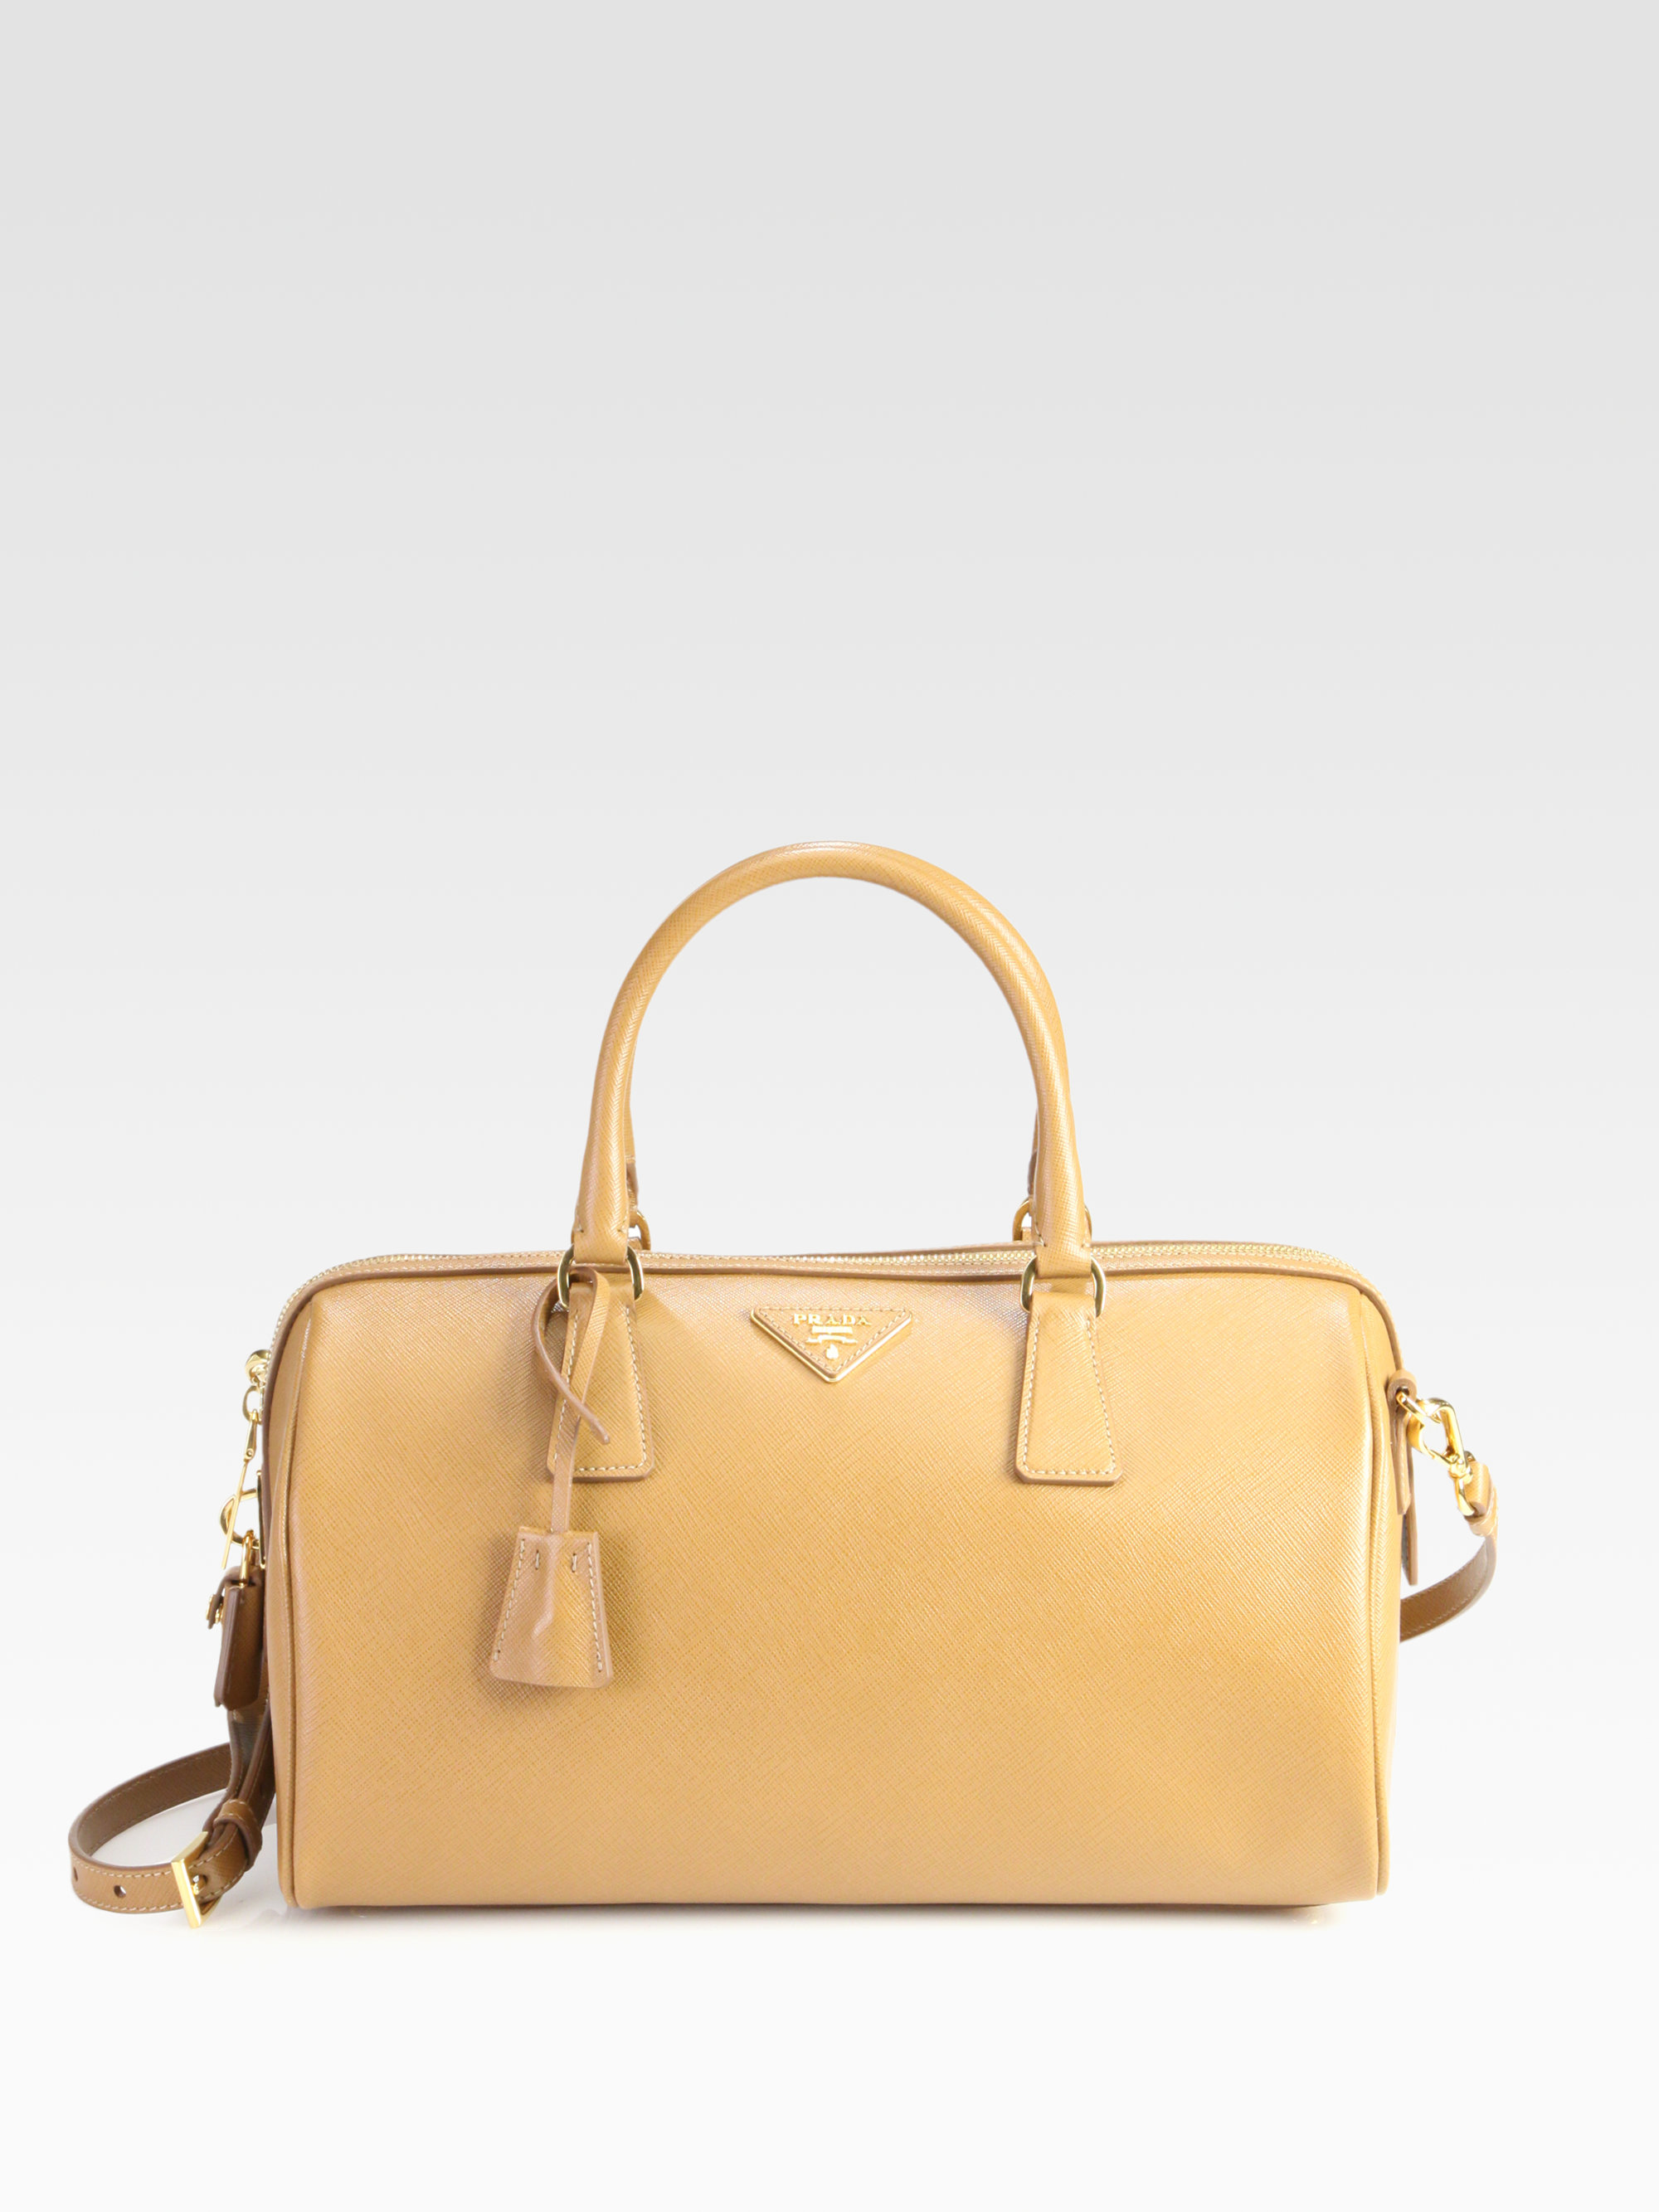 Prada Convertible Saffiano Lux Boston Bag in Beige (caramel) | Lyst